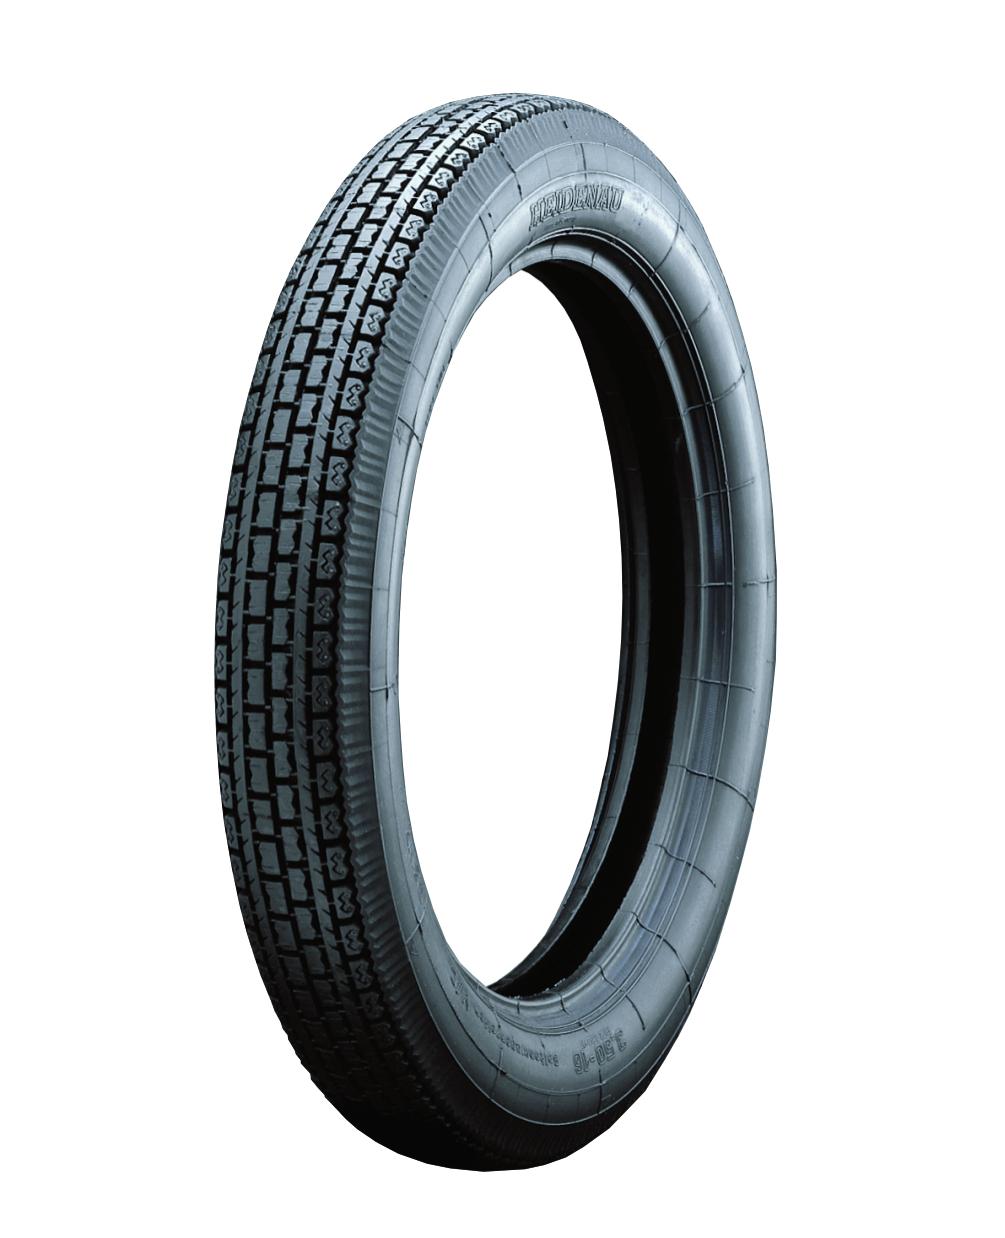 K29 | Heidenau Motorcycle Tyres | Heidenau Australia